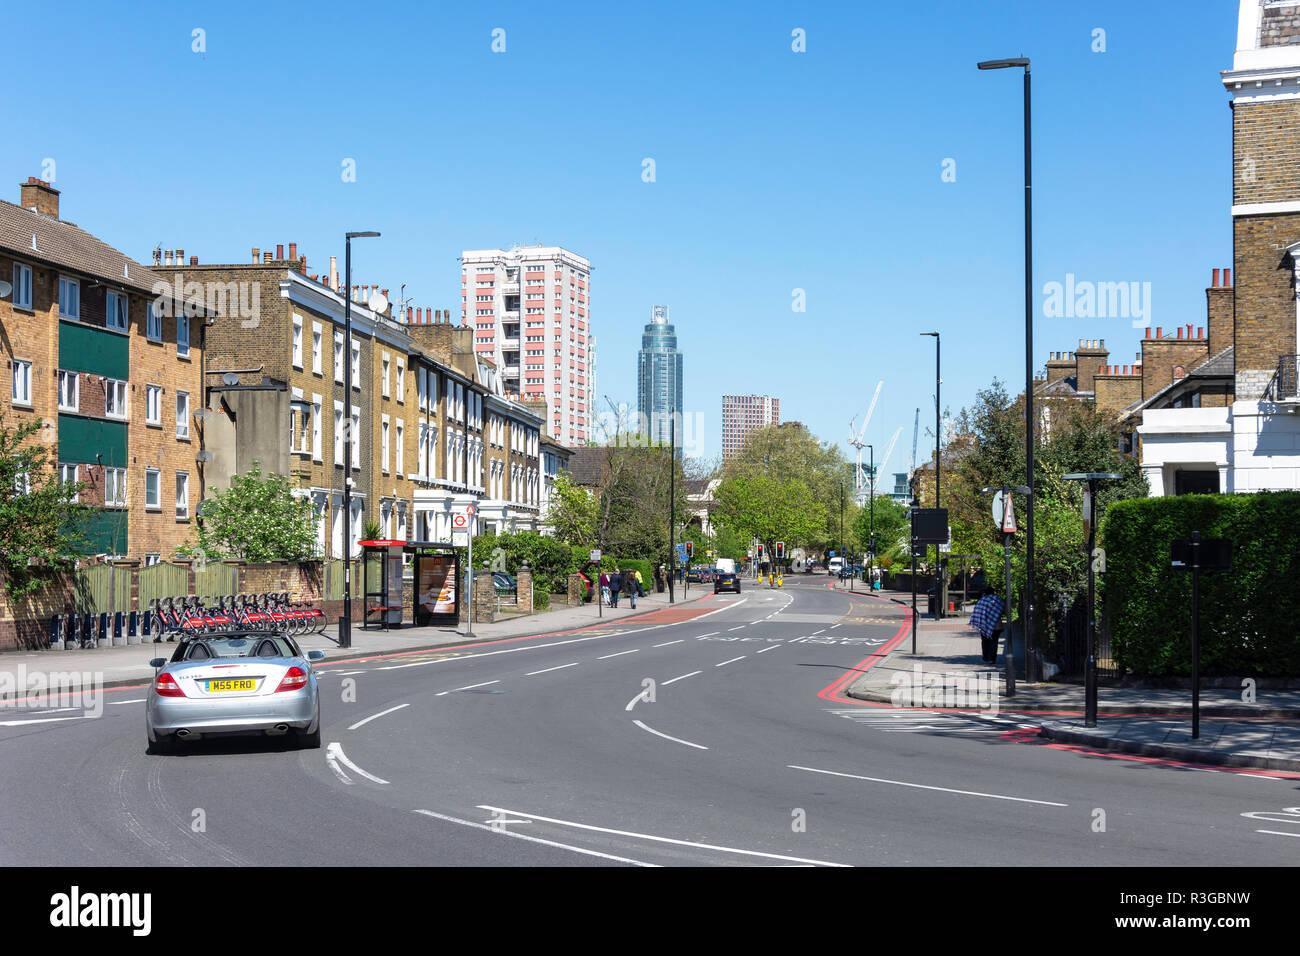 South Lambeth Road, Stockwell, London Borough of Lambeth, Greater London, England, United Kingdom - Stock Image